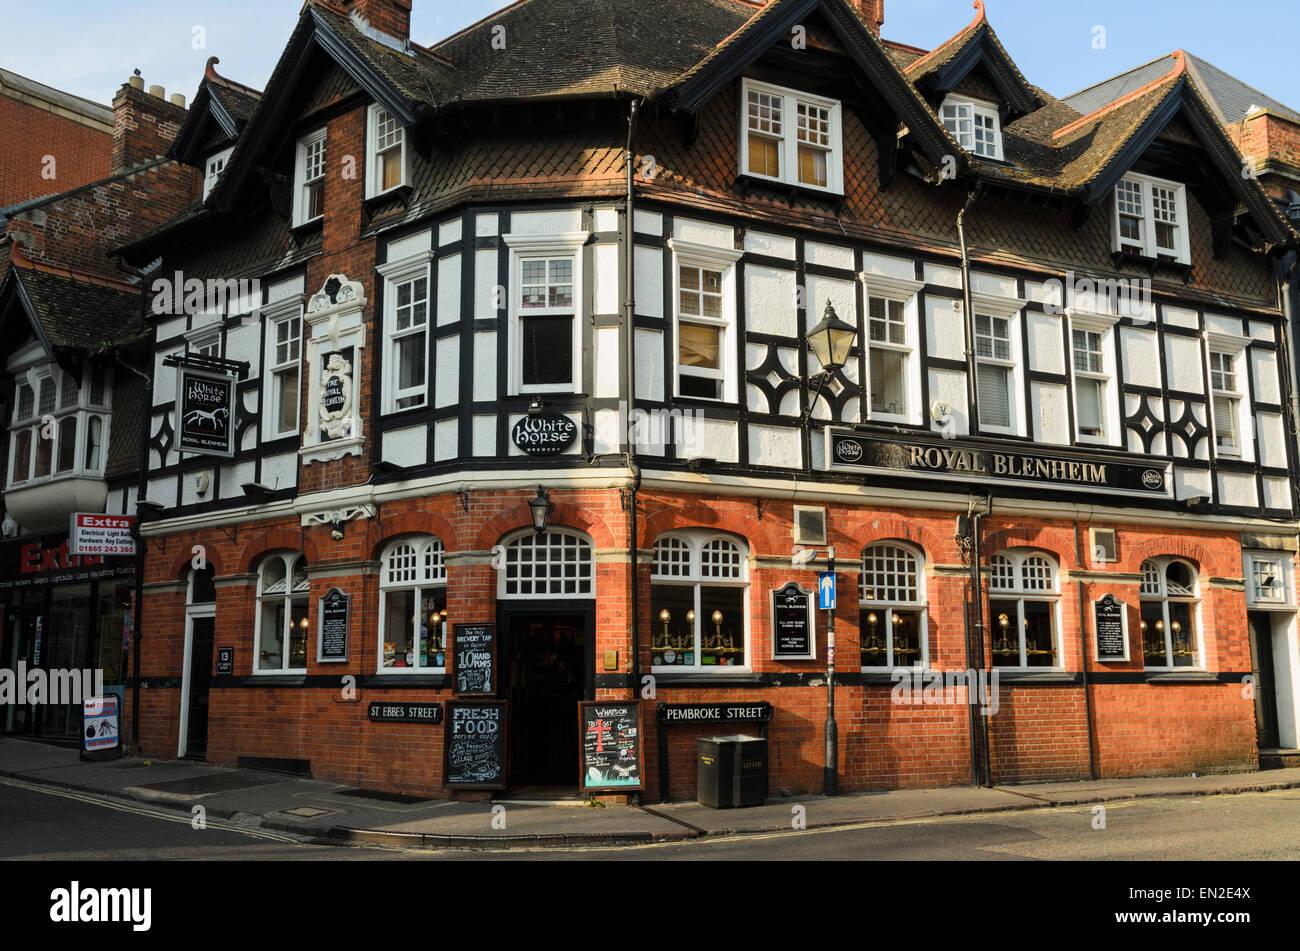 The Royal Blenheim Pub, St Ebbes, Oxford, U.K - Stock Image